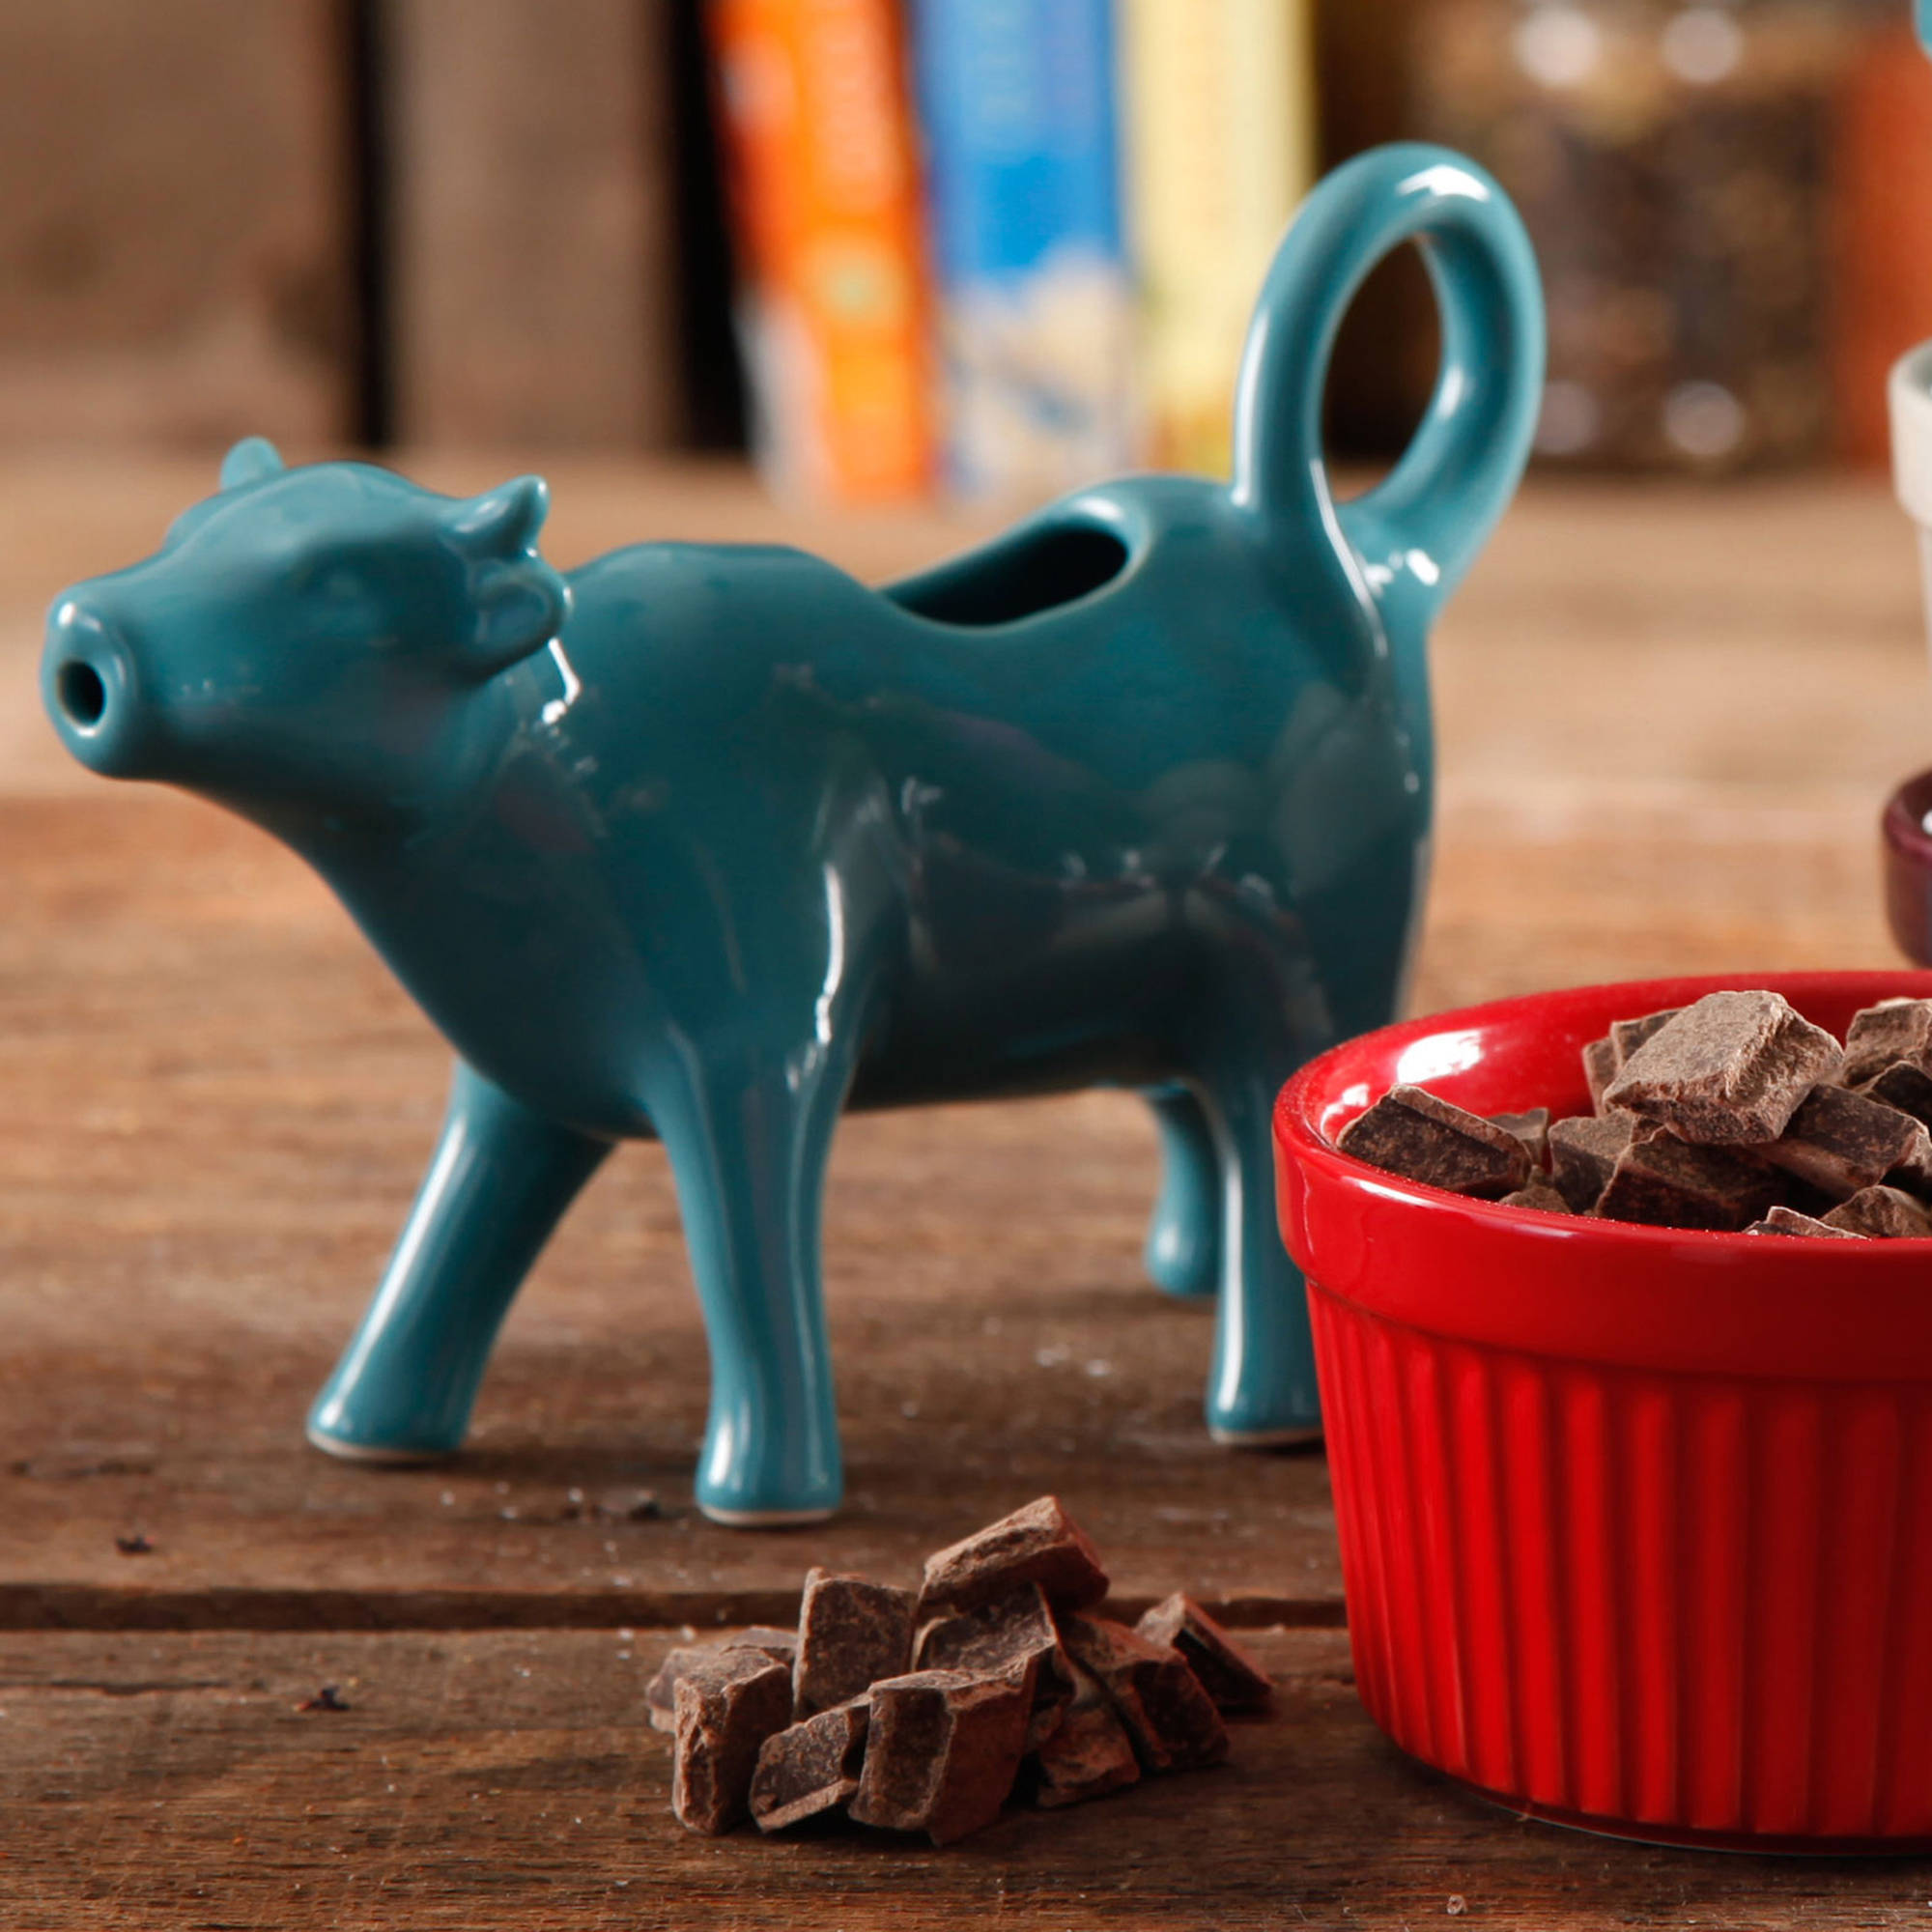 The Pioneer Woman Flea Market Teal Cow Shape Creamer - Walmart.com